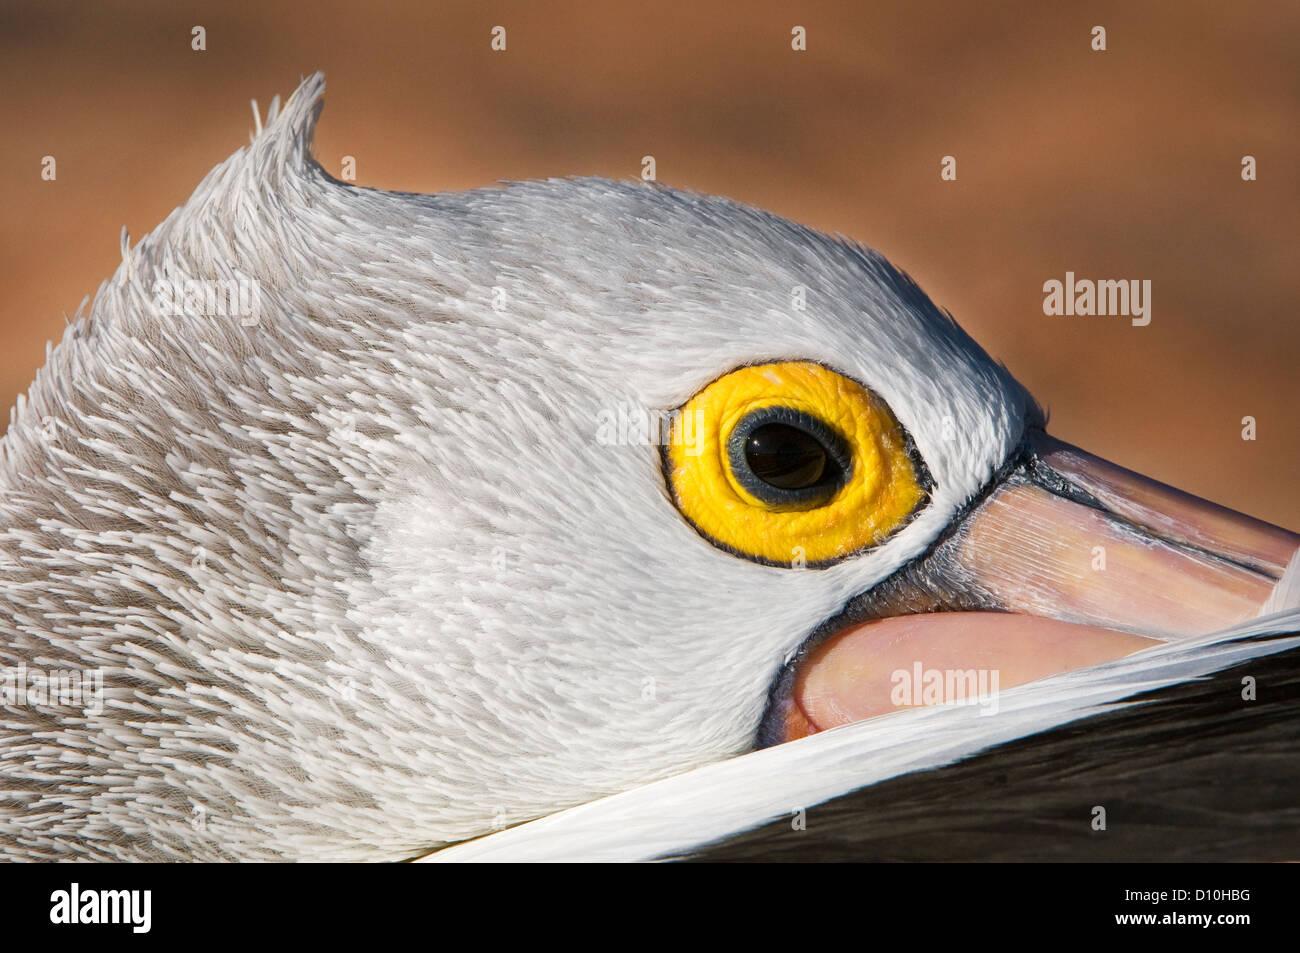 Head of an Australian Pelican. - Stock Image